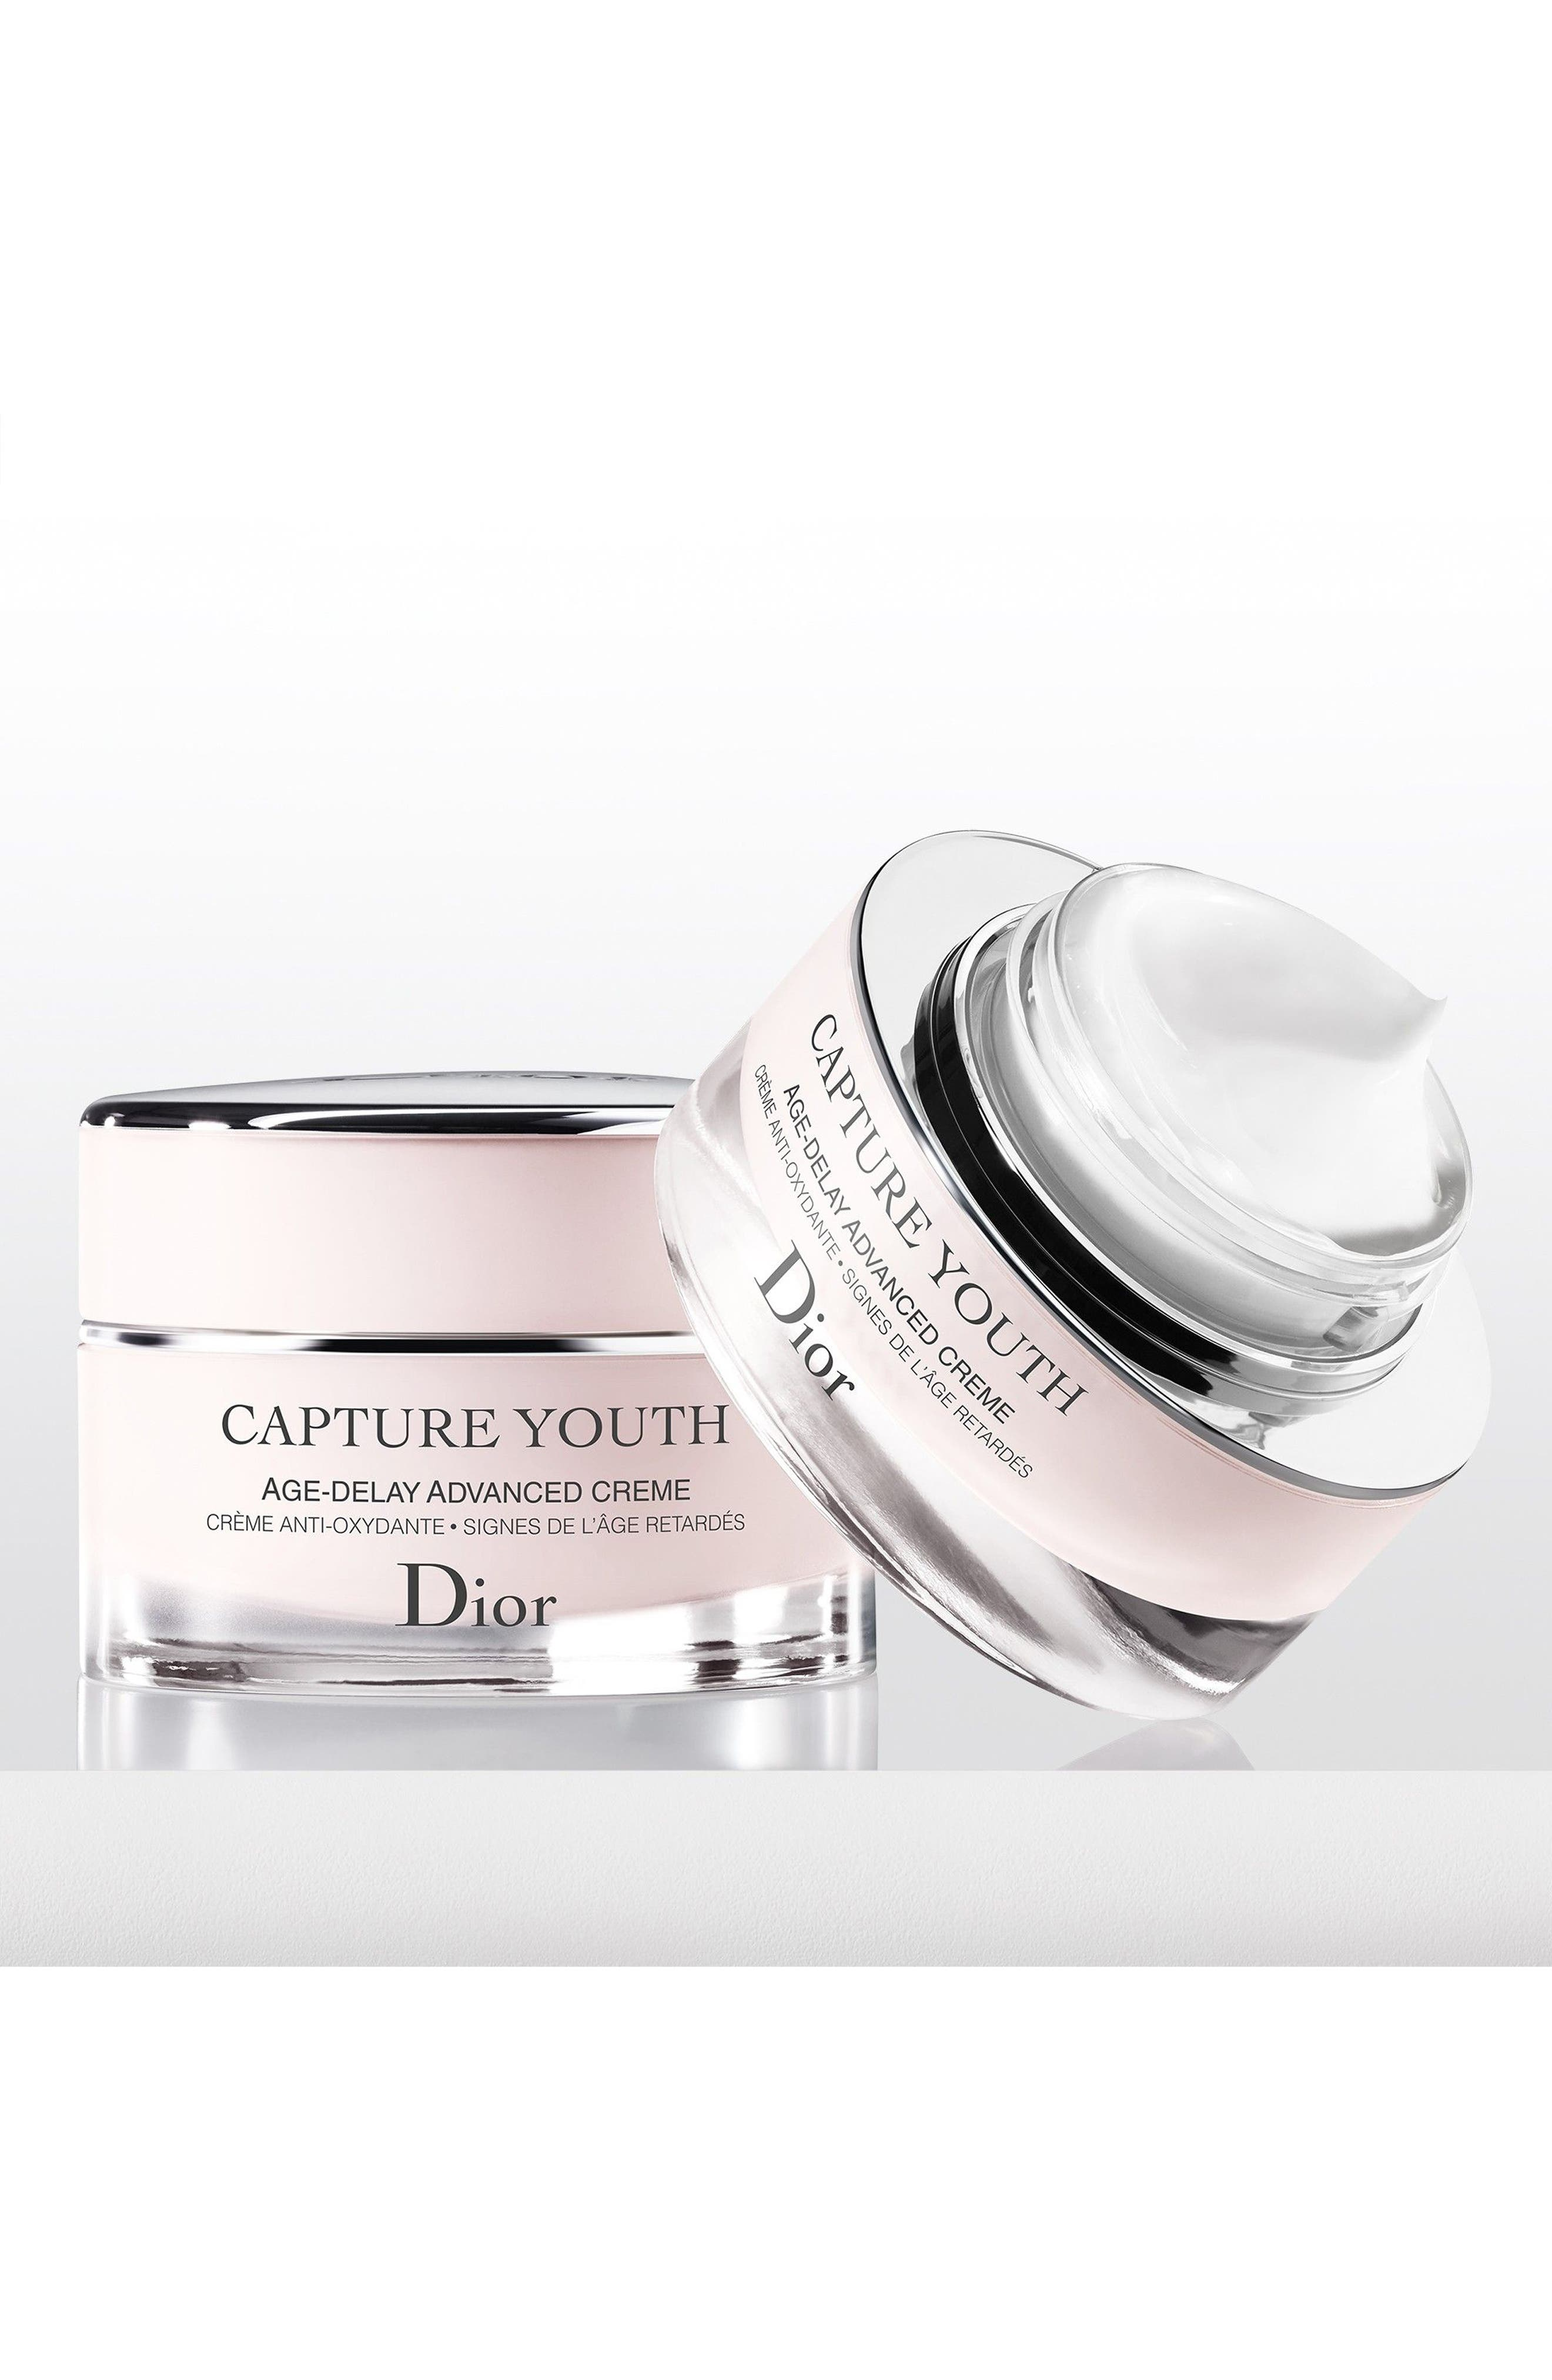 Capture Youth Age-Delay Advanced Crème,                             Alternate thumbnail 2, color,                             NO COLOR